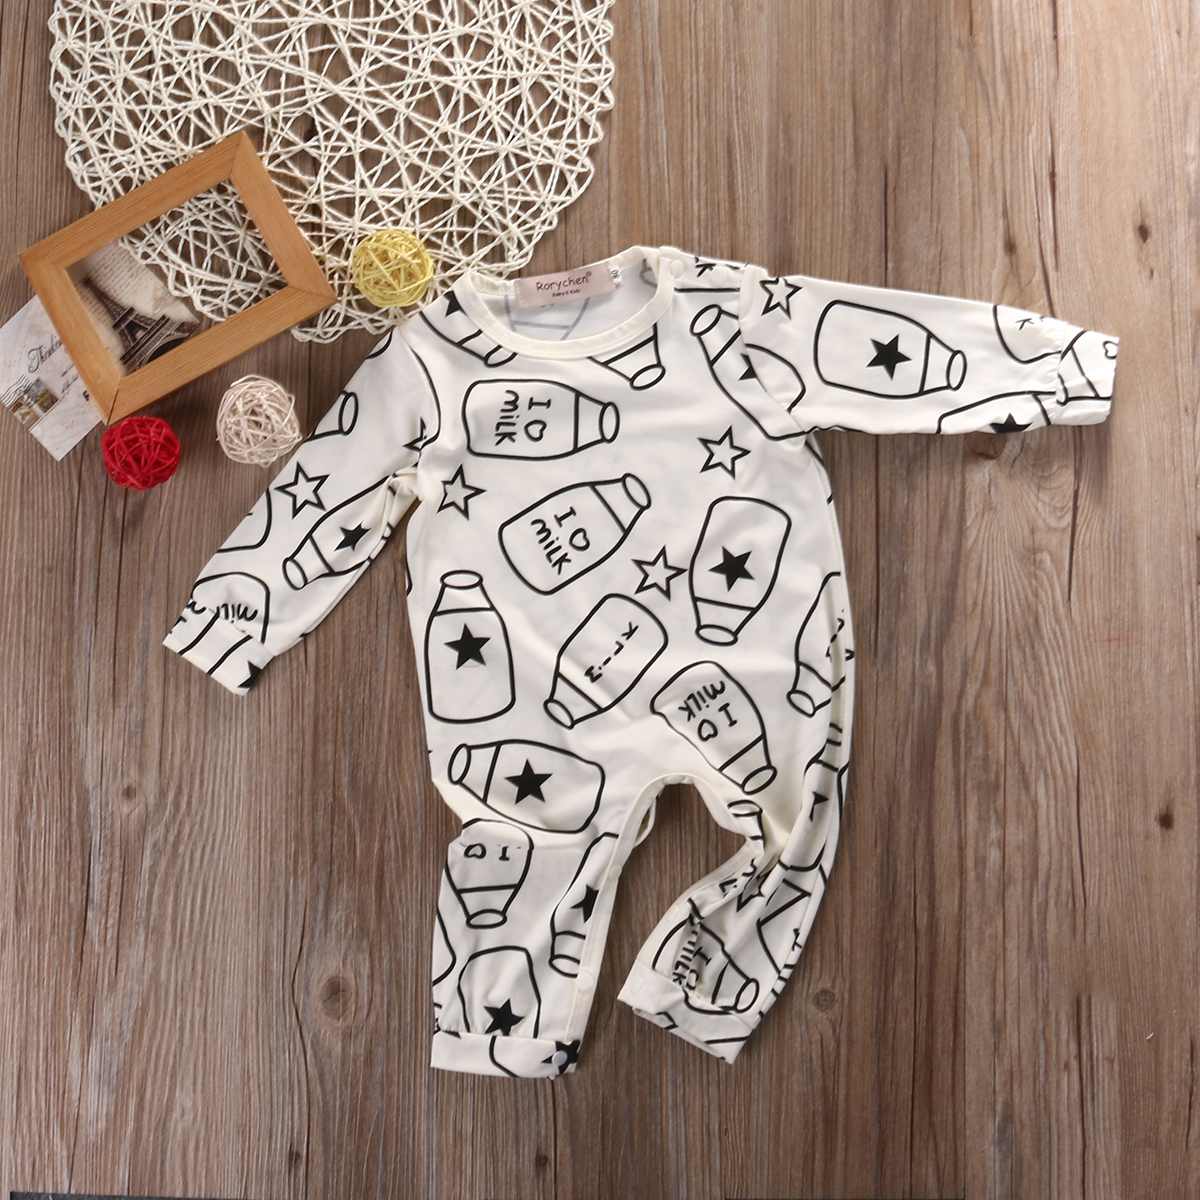 Top-Baby-Kids-Boy-Girl-Infant-Long-Sleeve-Romper-Milk-bottle-Jumpsuit-Cotton-Clothes-Outfit-Set-2